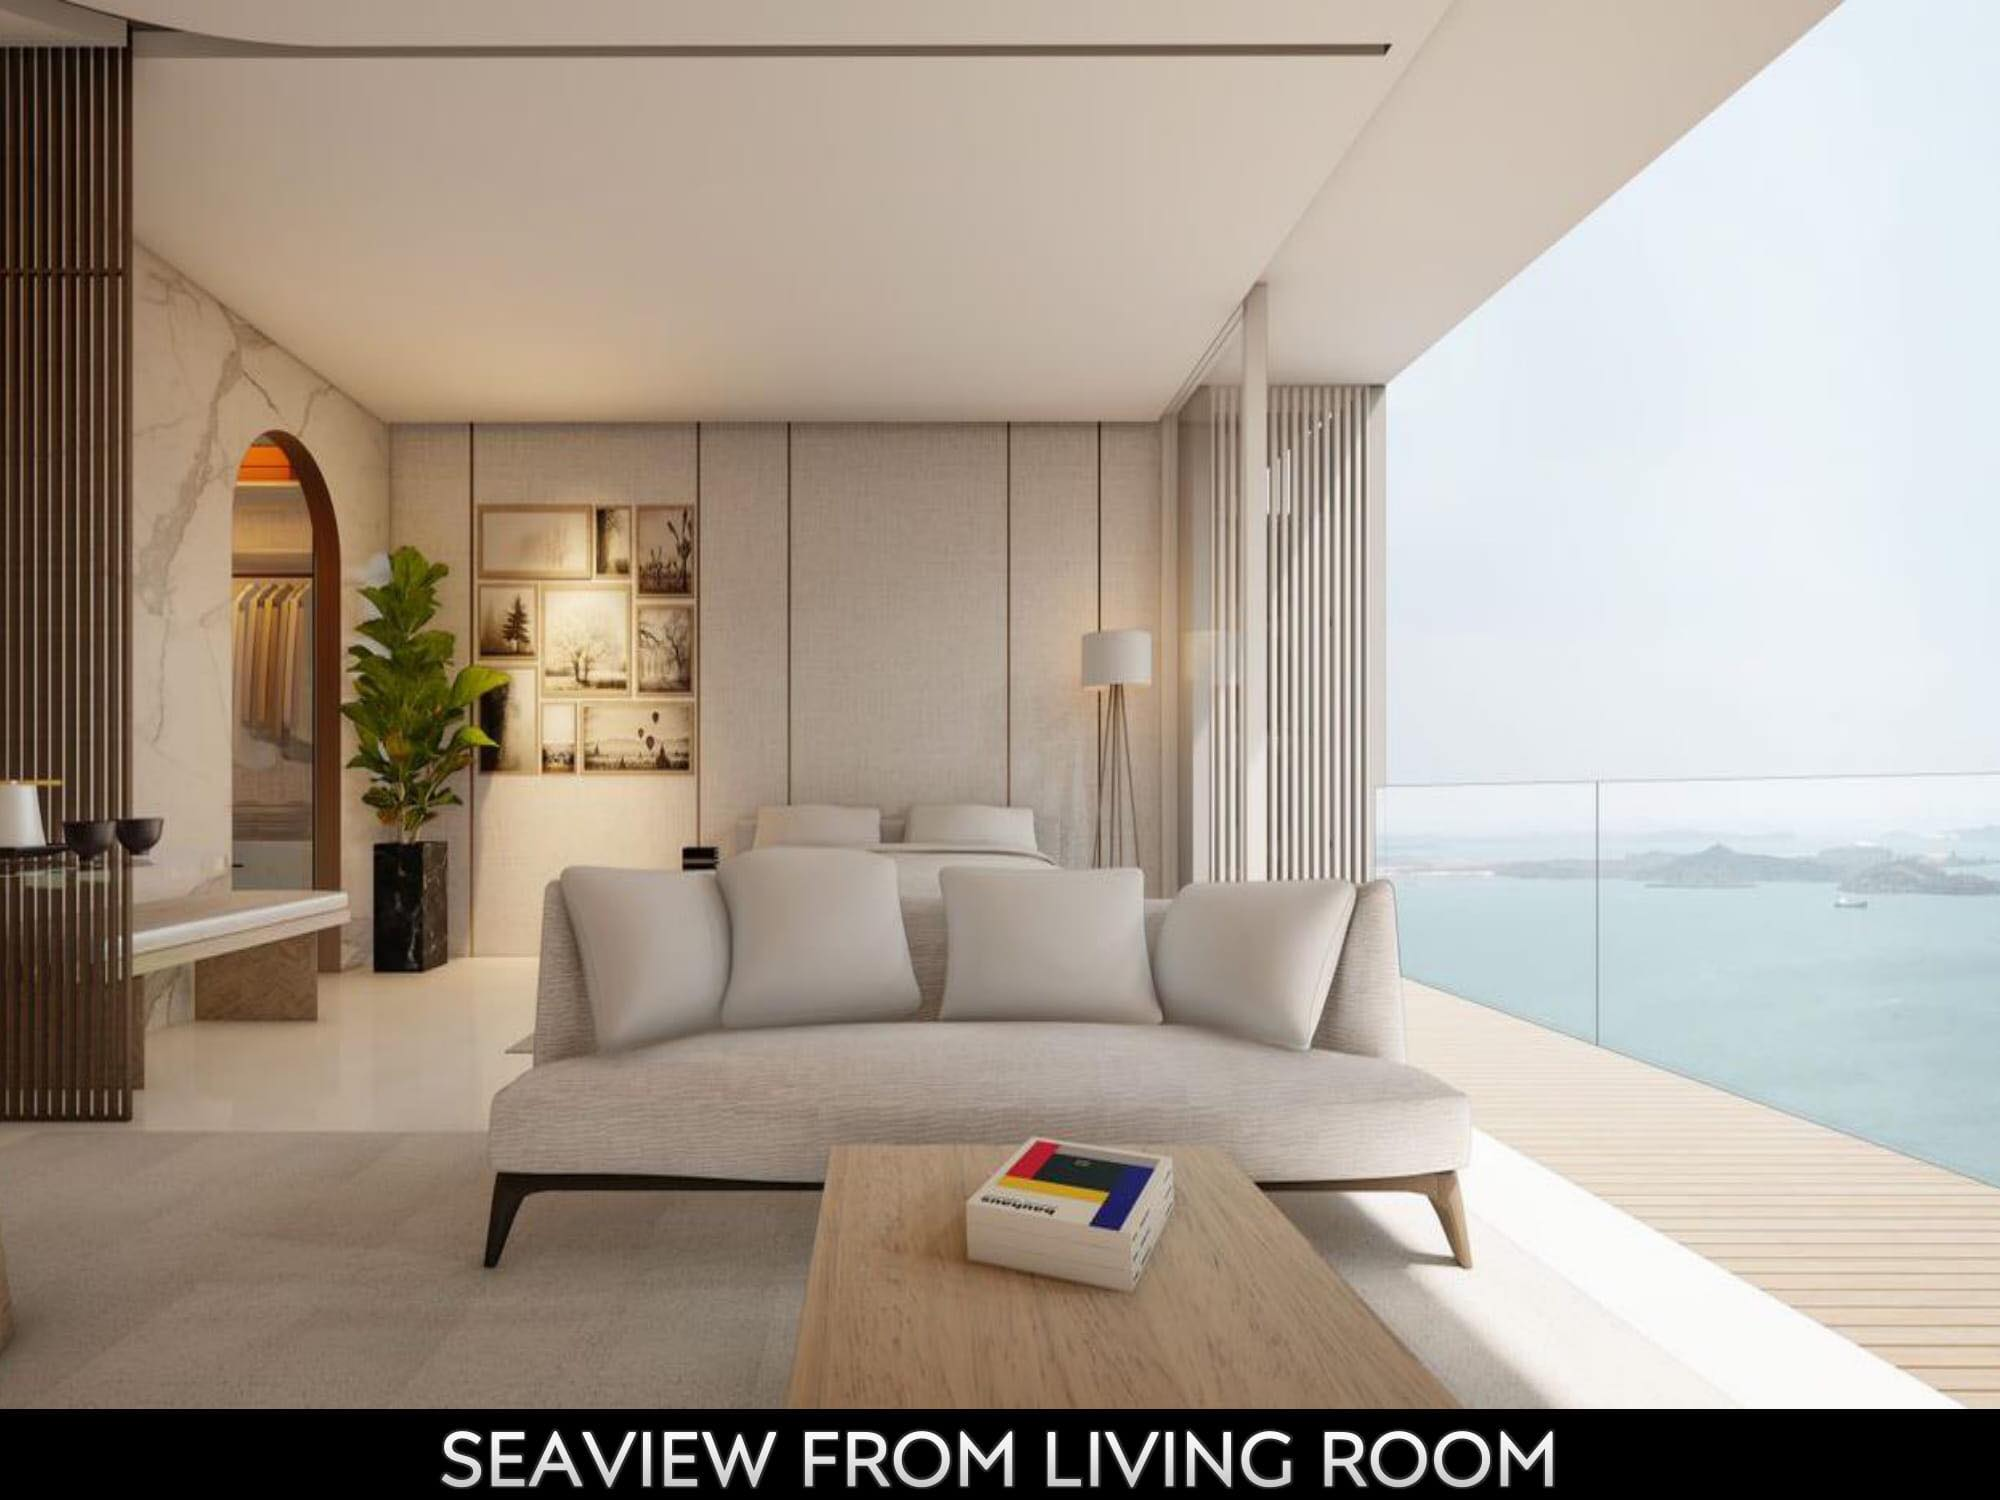 Opus Bay seaview units